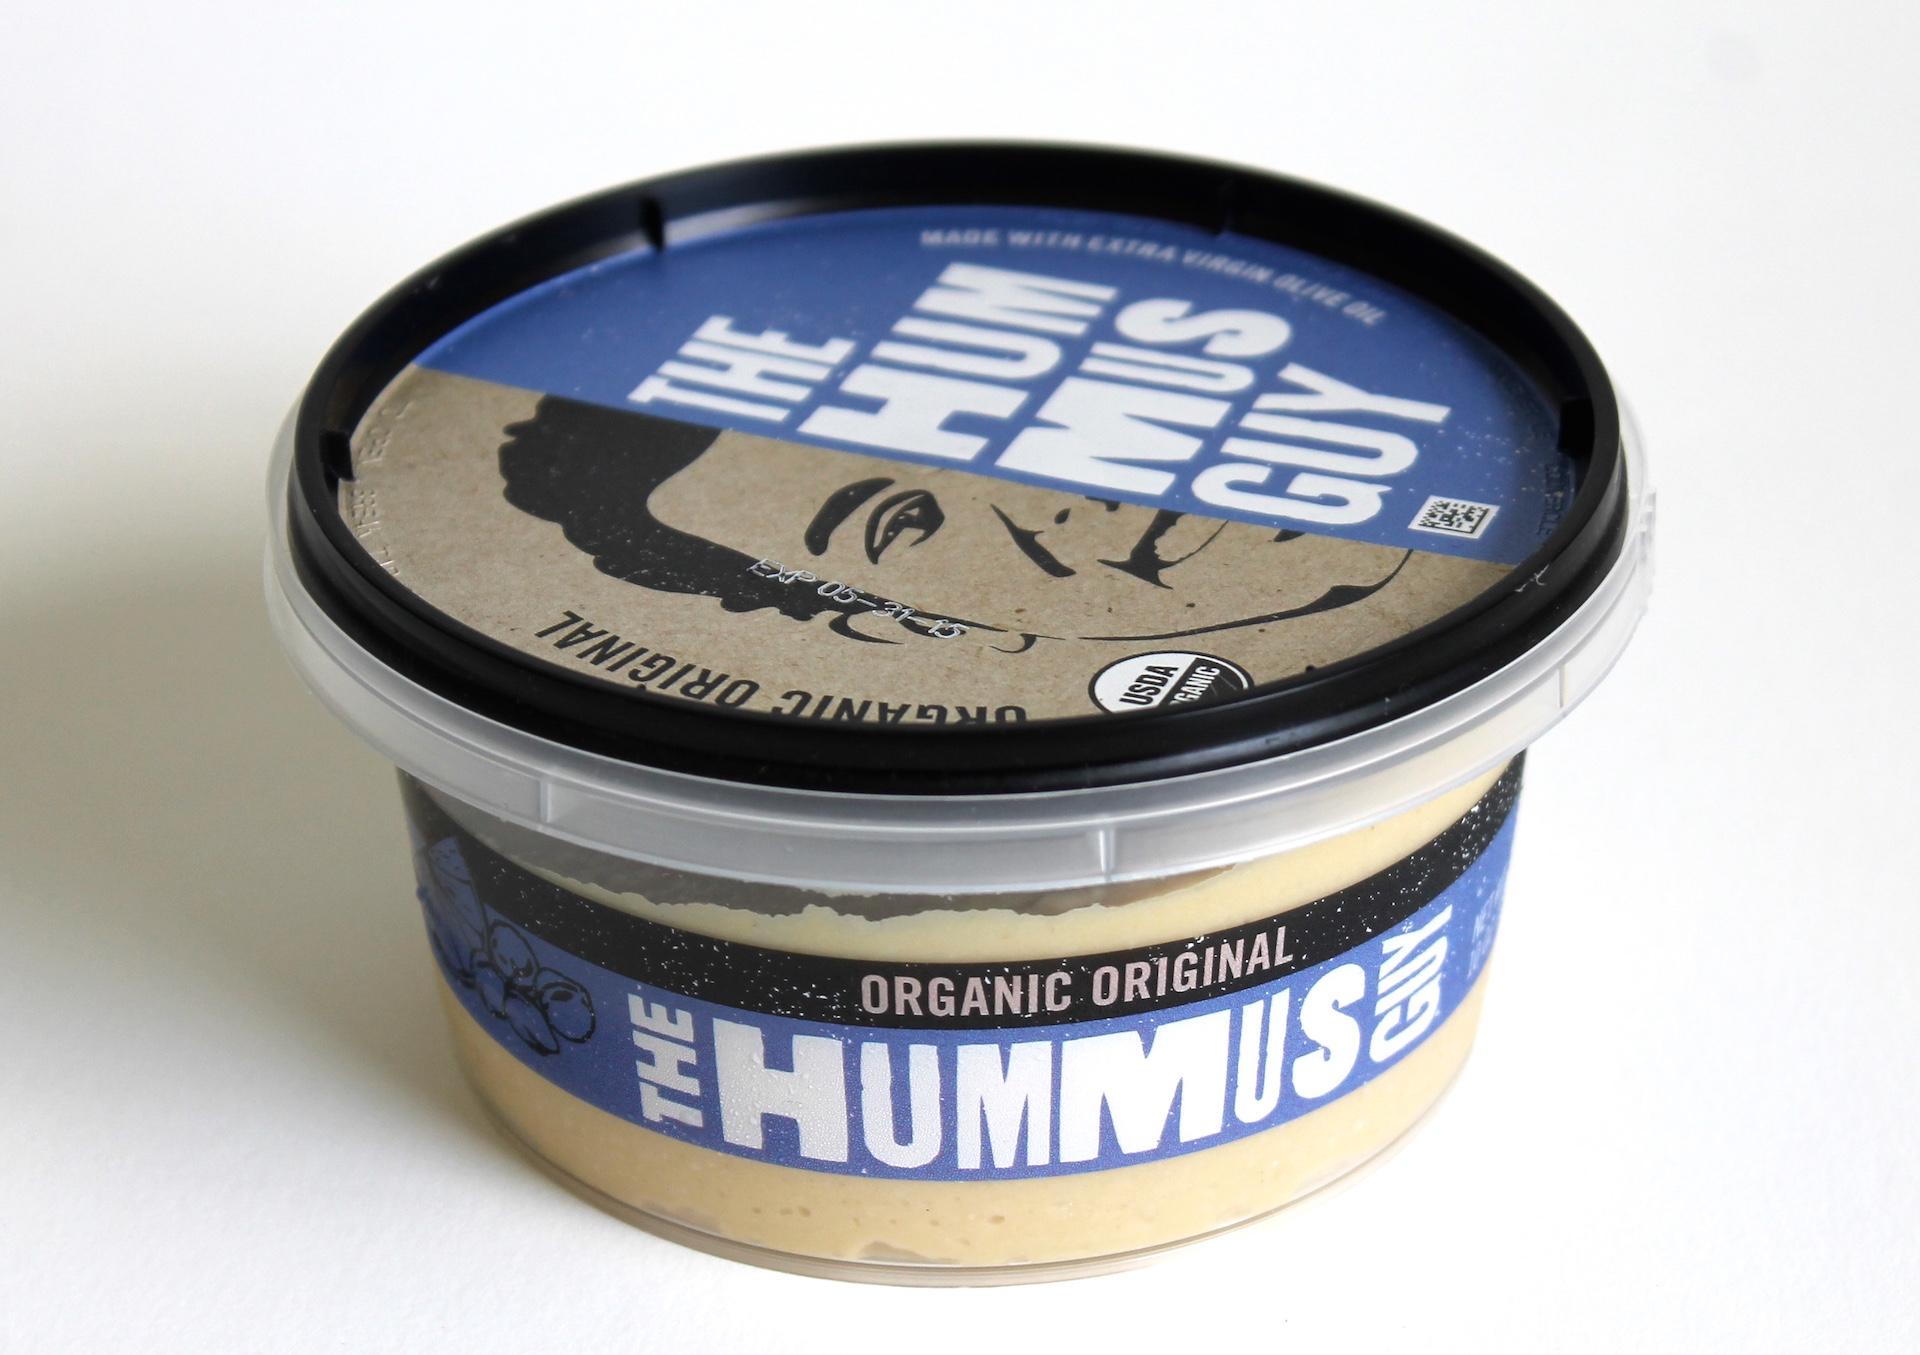 The Hummus Guy Organic Original